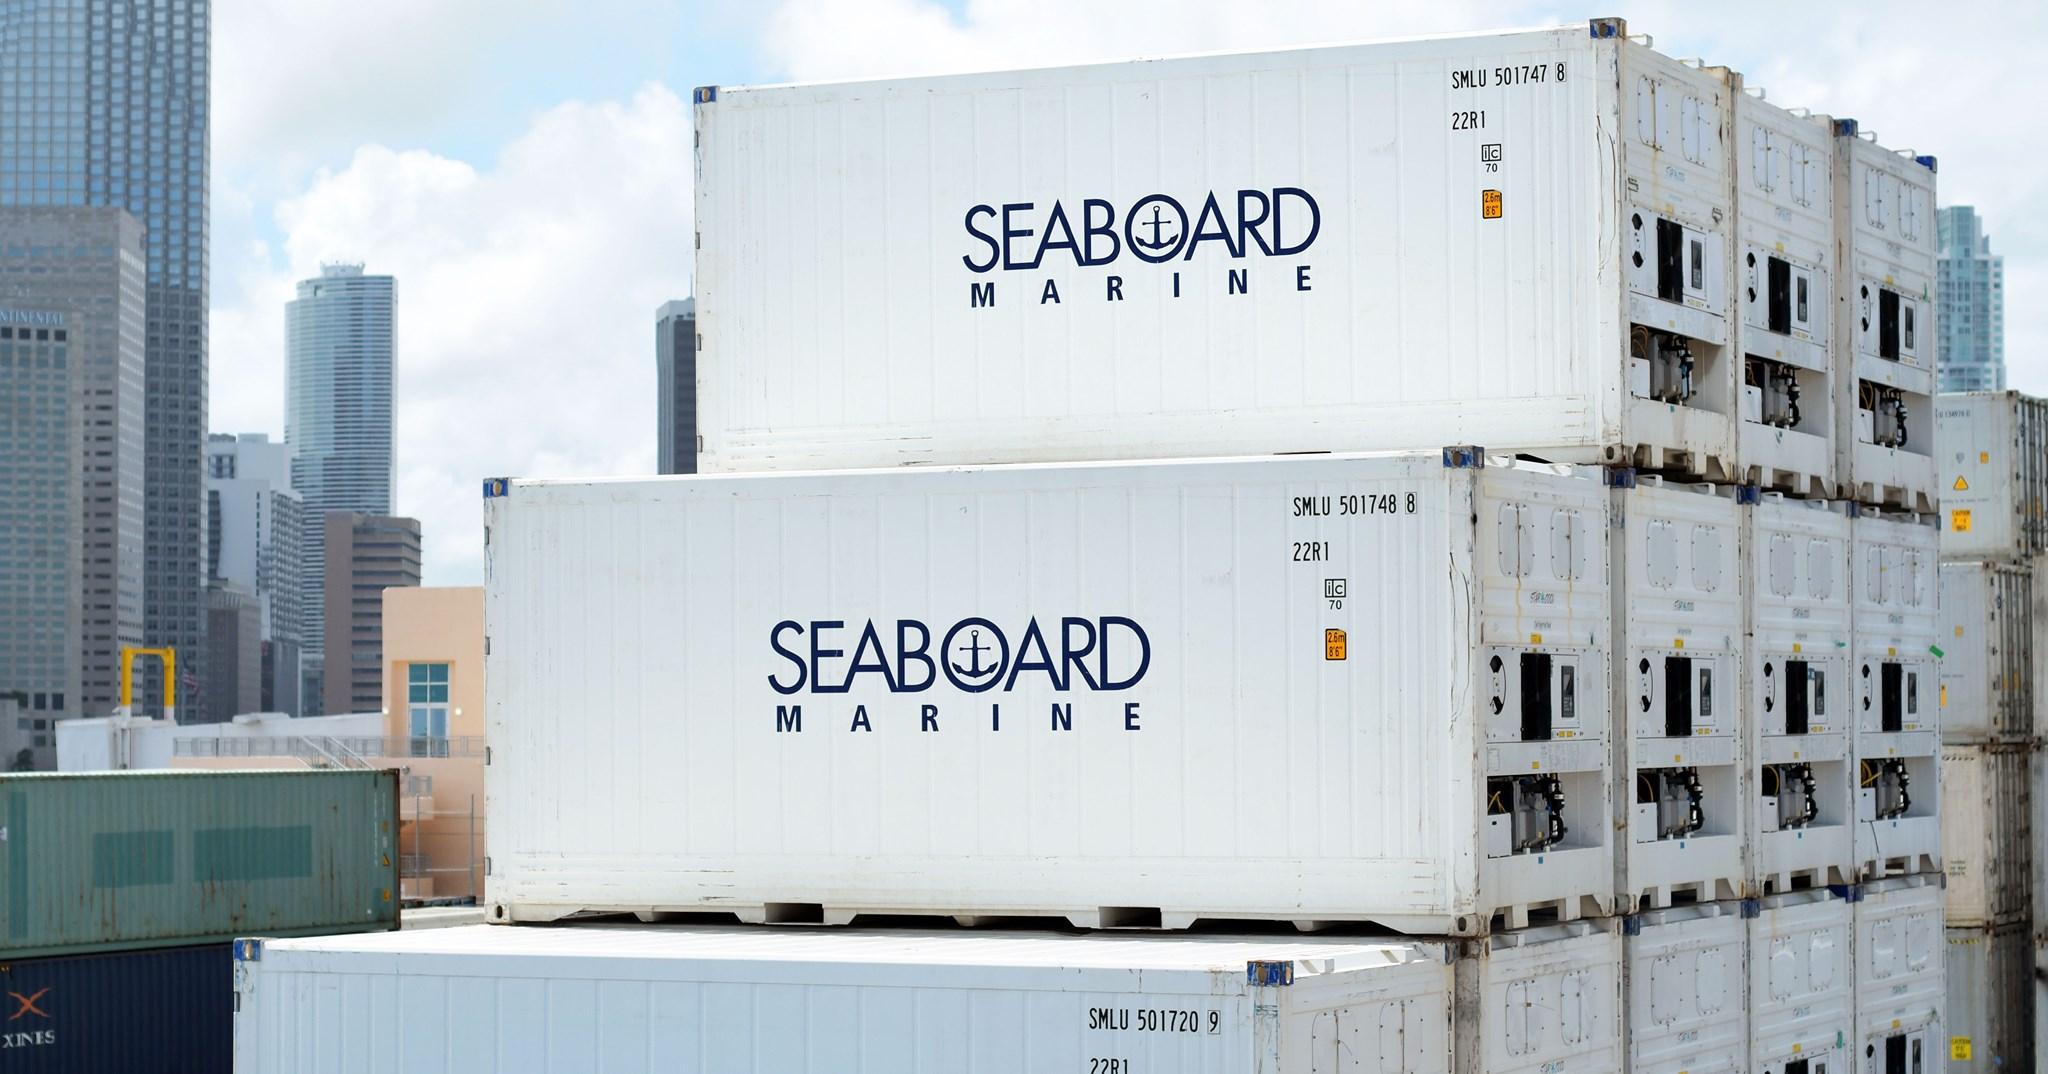 Globe Tracker & Wireless Maritime Services for Seaboard Marine